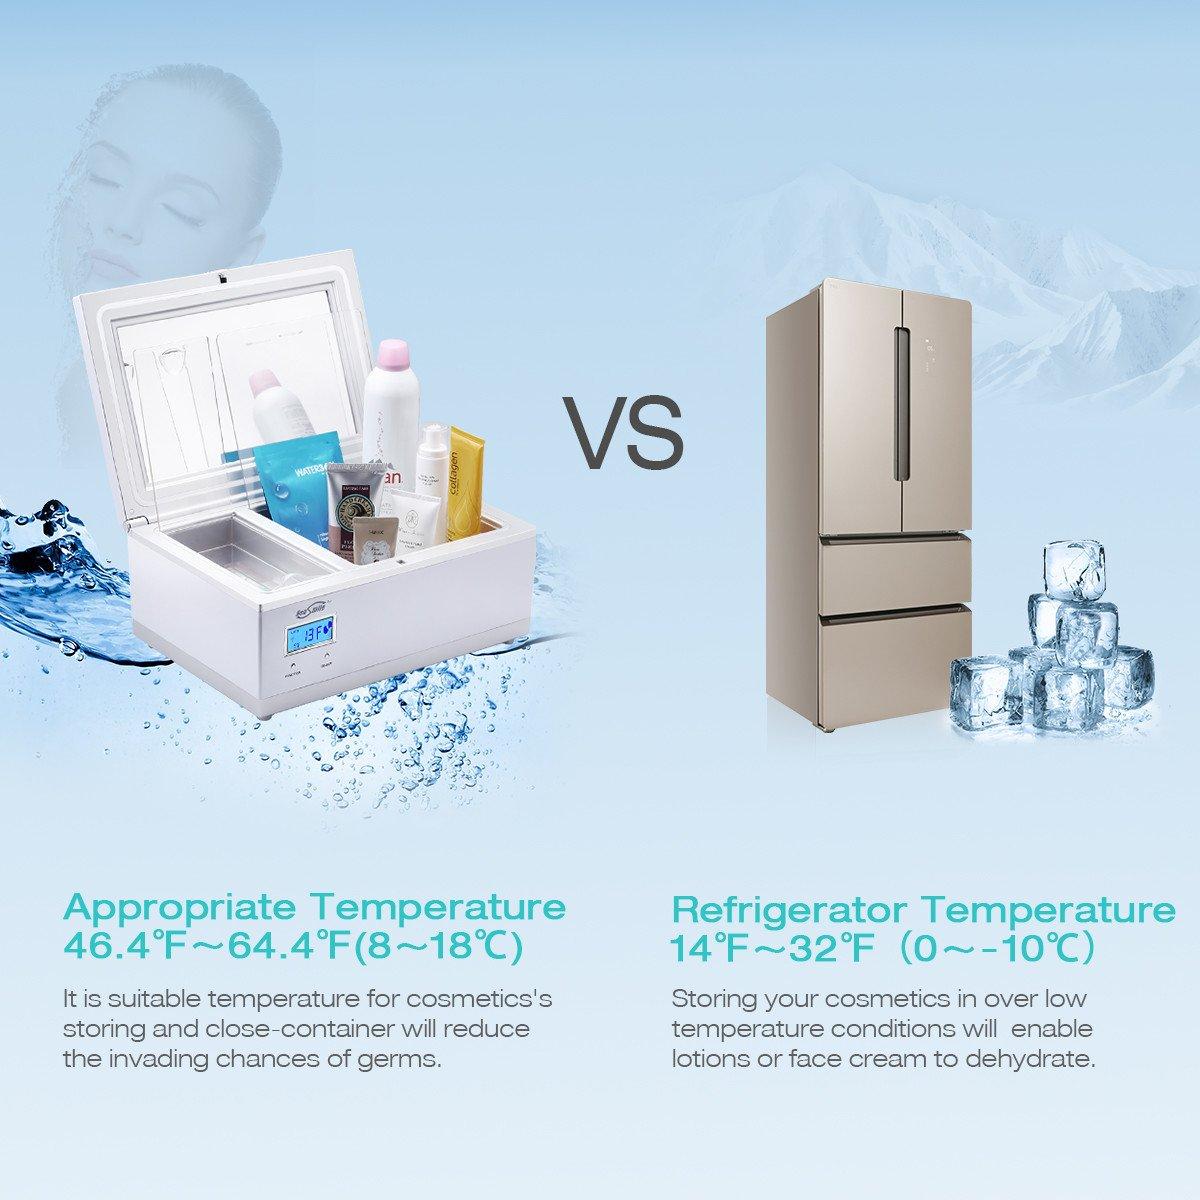 Mini Fridge, Housmile Electric Cooler Mini Refrigerator Thermoelectric Cosmetic Small Fridge for Eye Cream, Facial Mask, Eyeliner, Skin Cream, Organic Cosmetics, 0.1 Cubic Feet(3 Liter) by Housmile (Image #2)